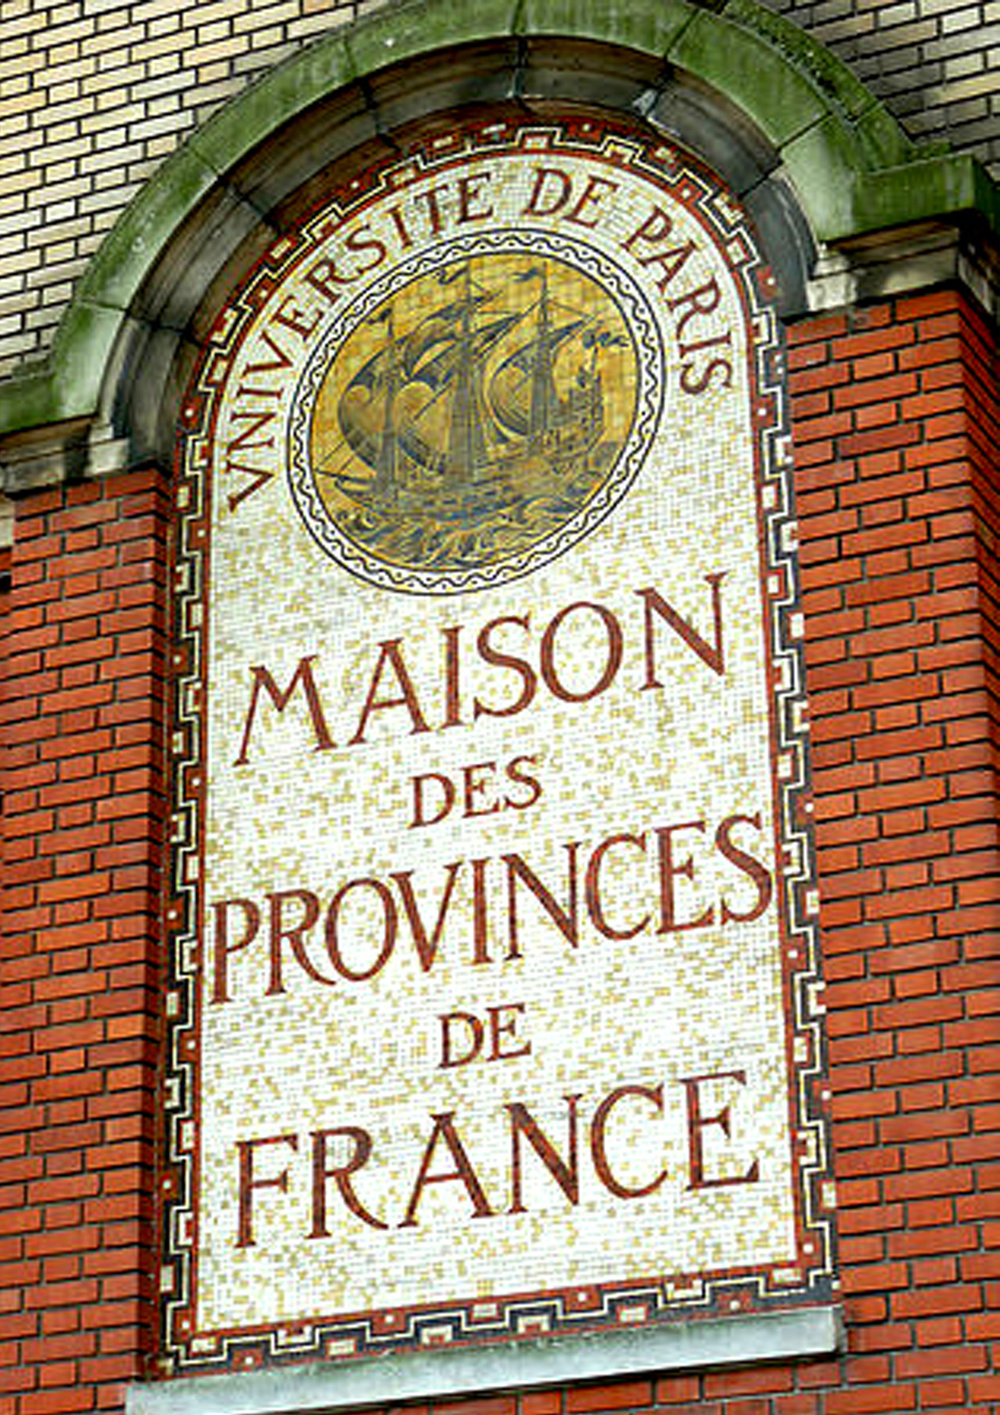 MPF (CIUP) - PARIS, FRANCEExpo: 28/05/2010 - 30/05/2010Vernissage: 28/05/2010